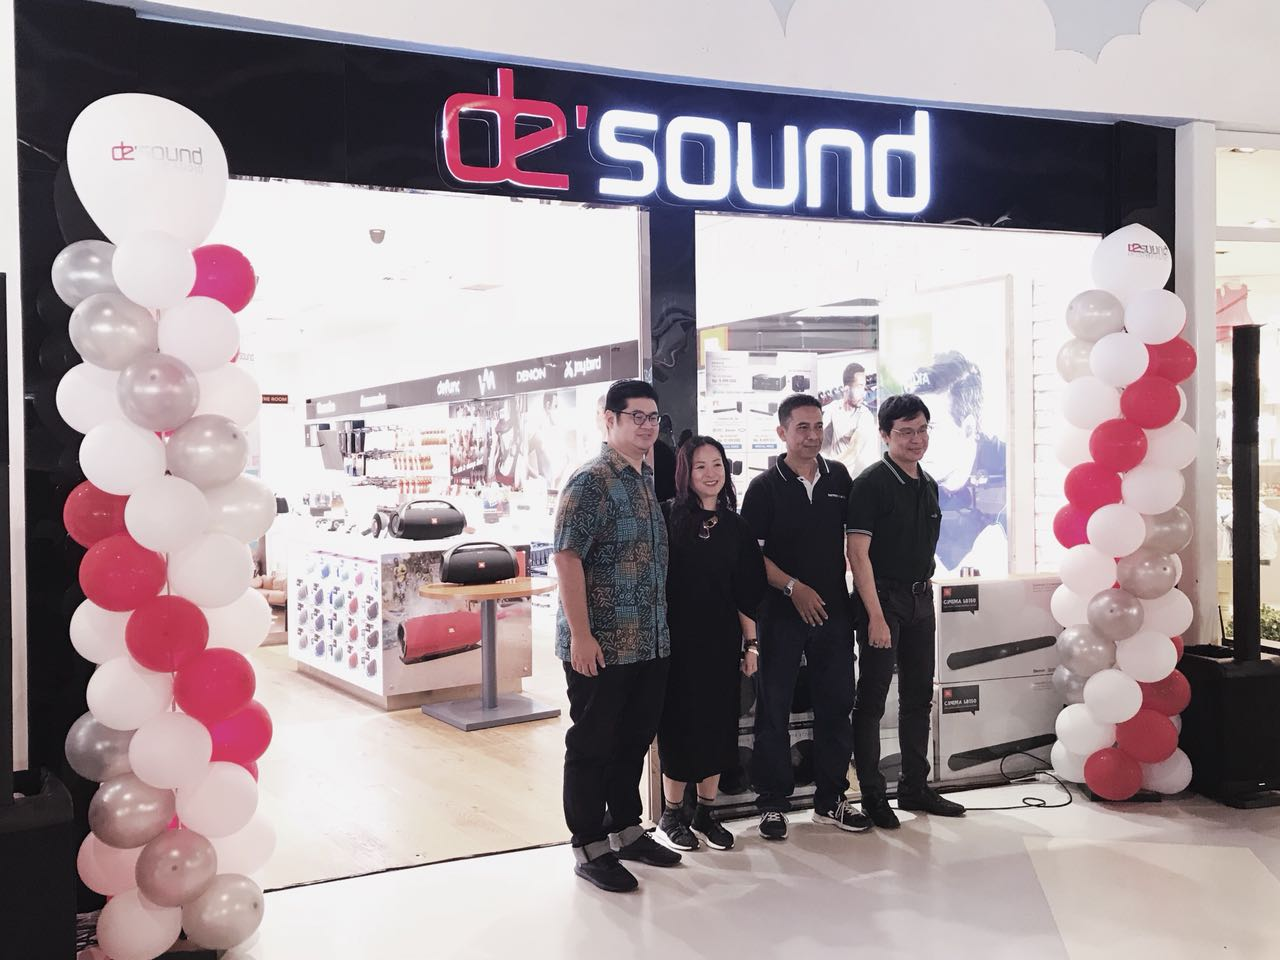 De'sound Bali 2